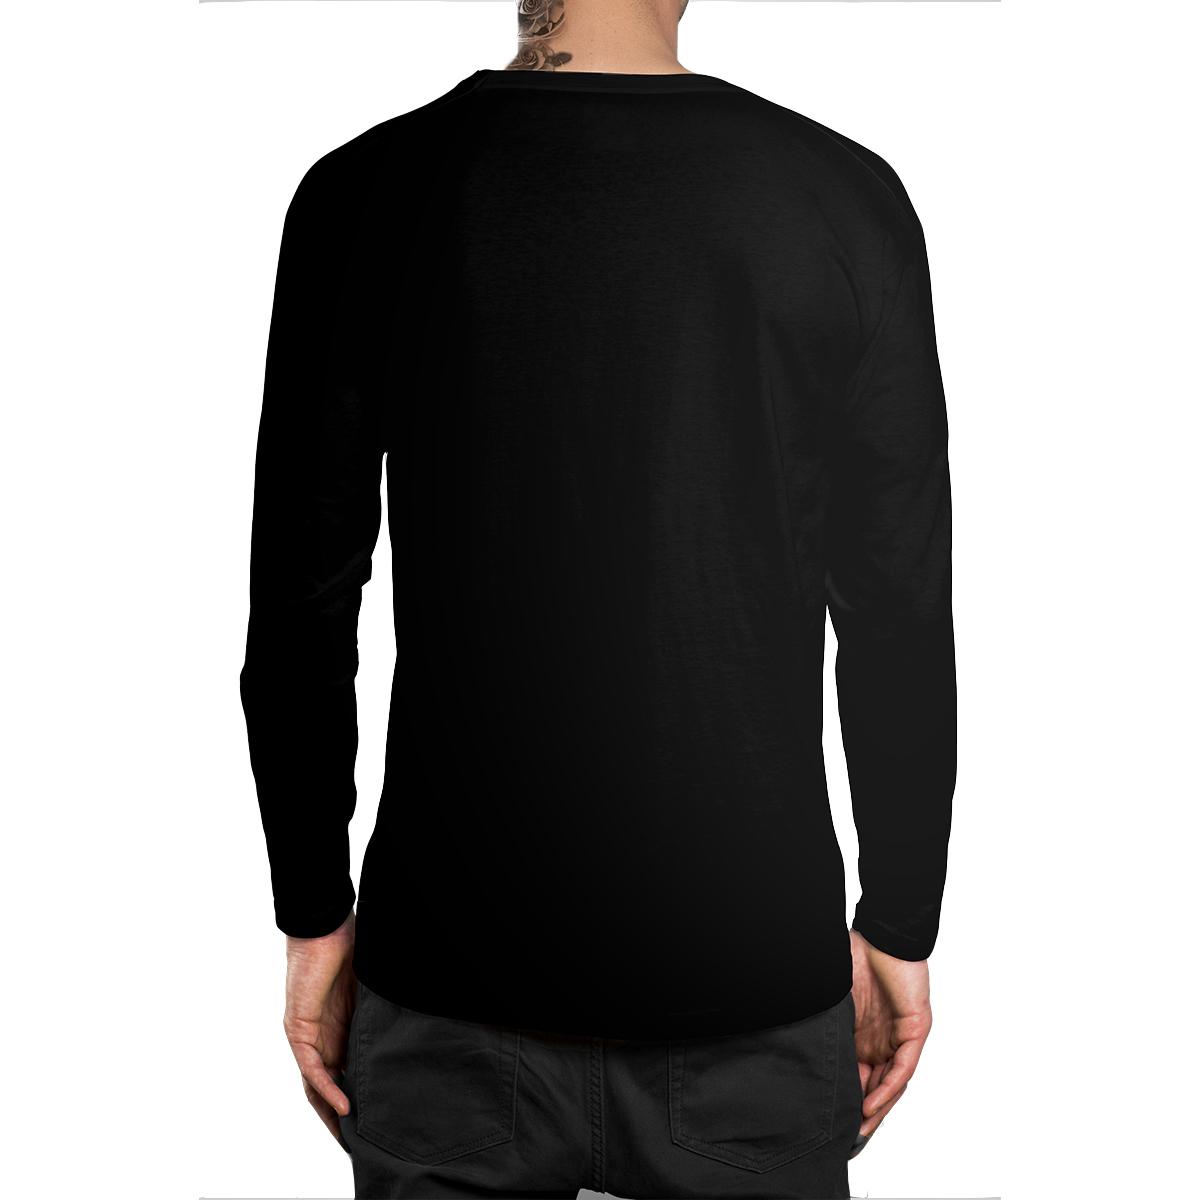 Stompy Camiseta Manga Longa Modelo 14